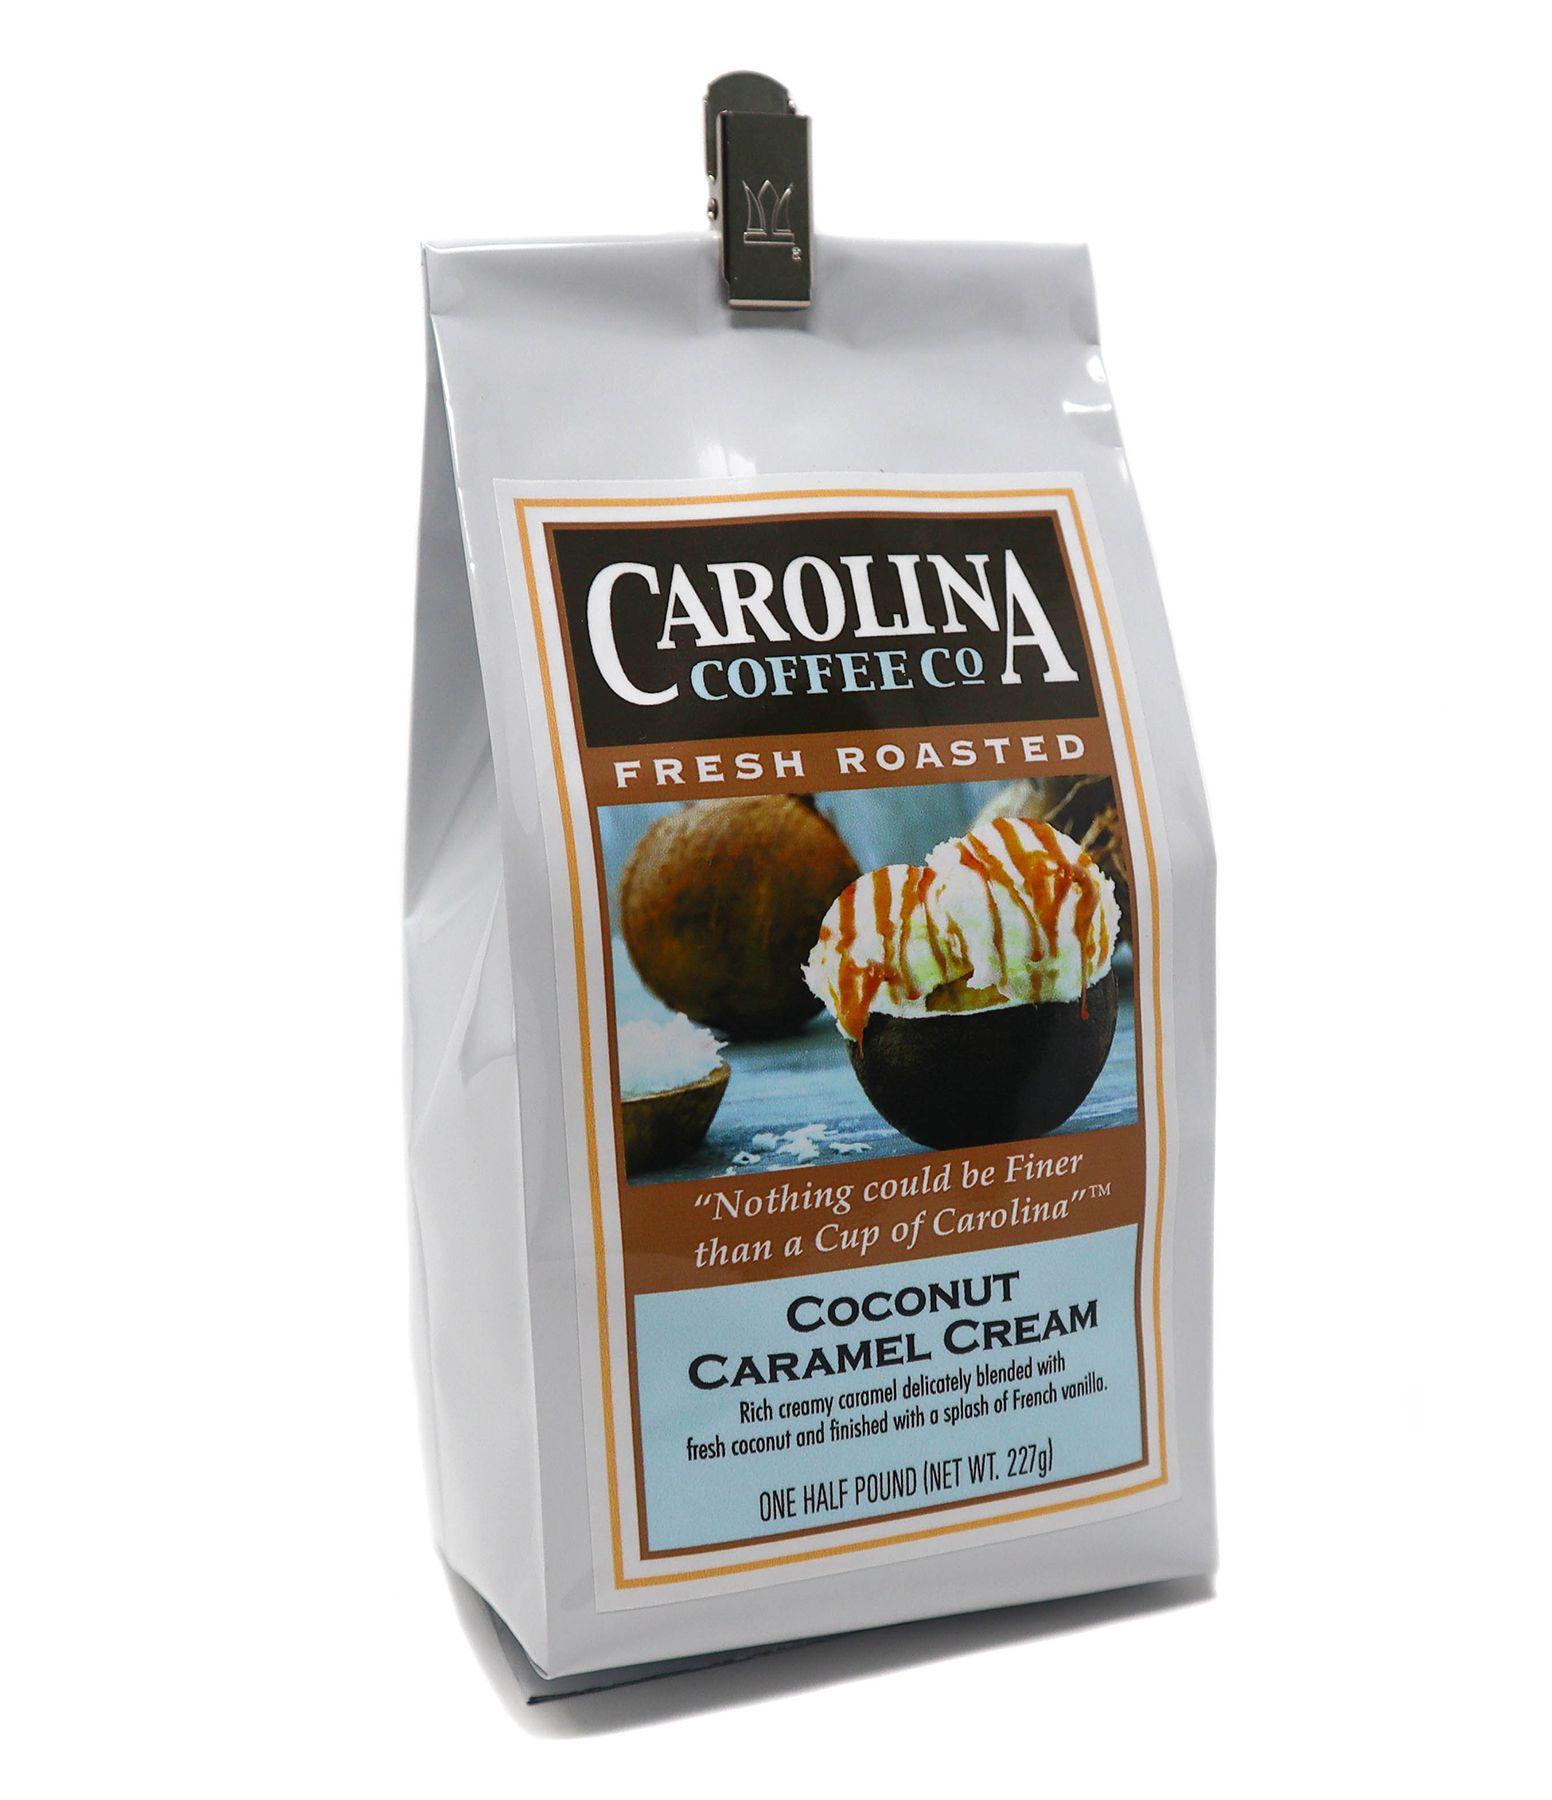 Carolina Coffee Coconut Caramel Cream